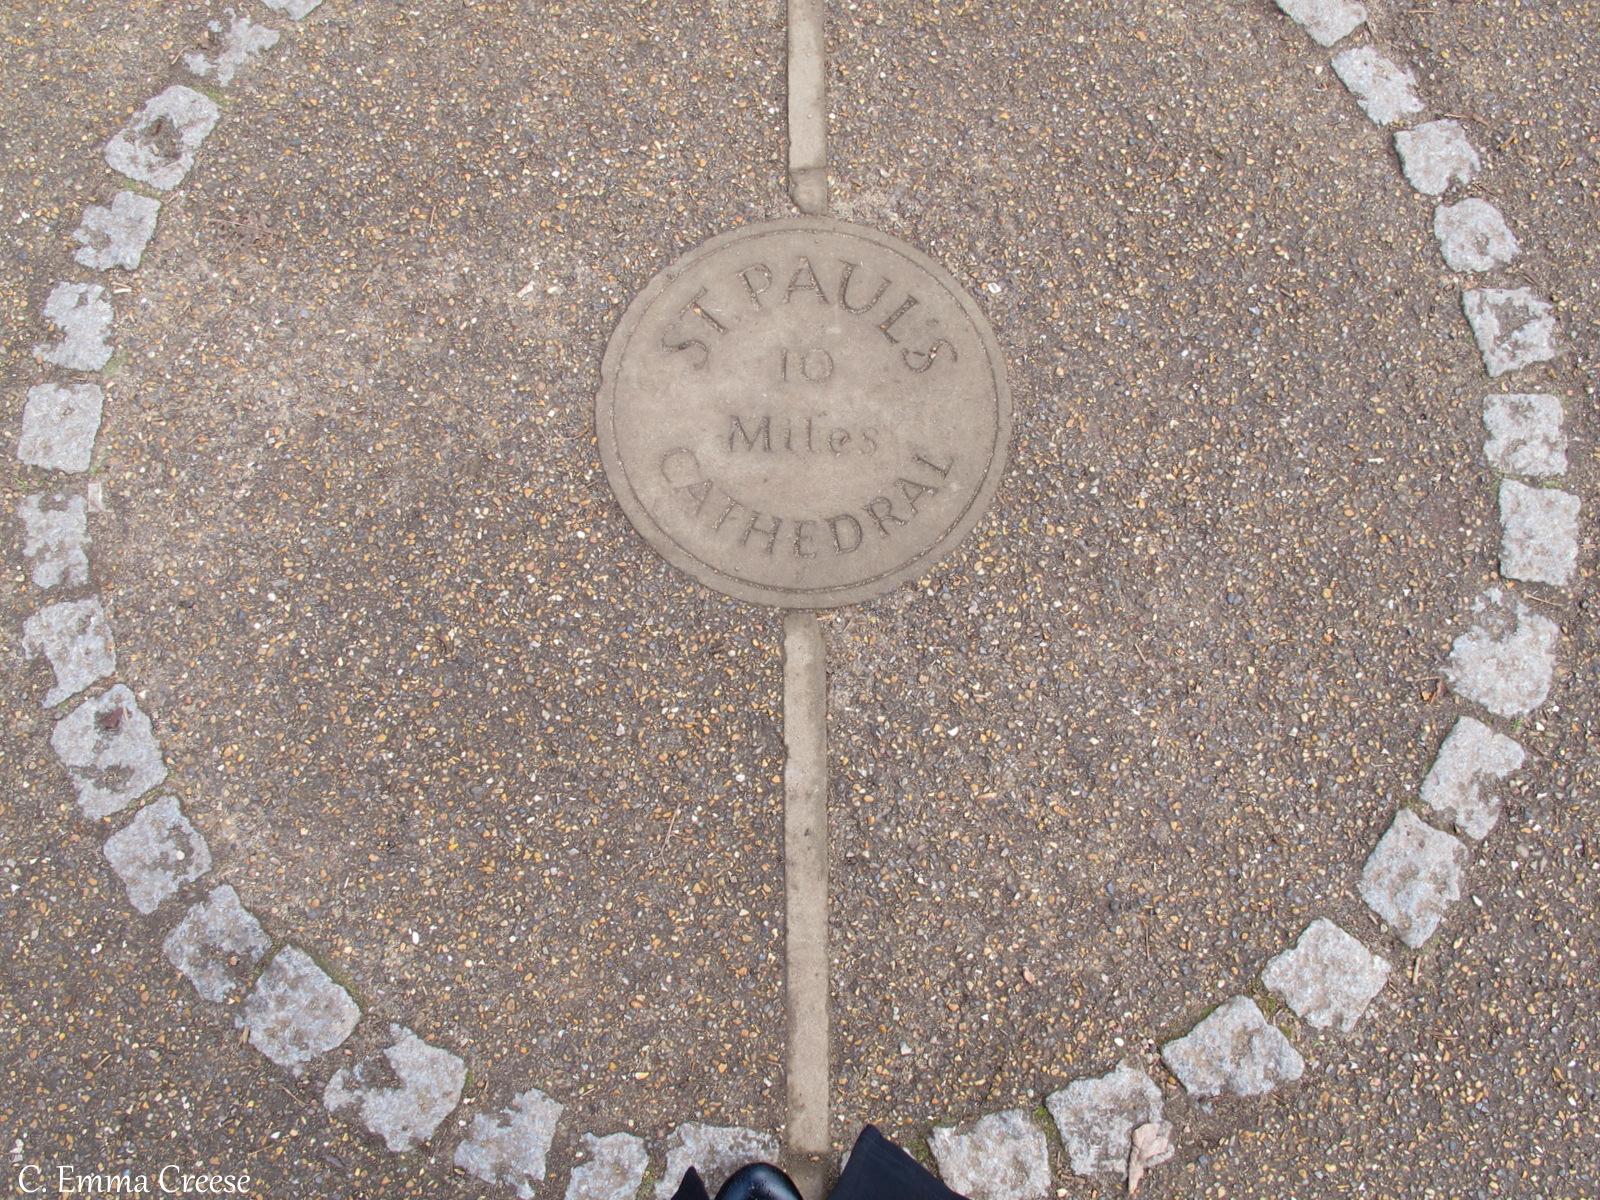 Richmond Park Staycation Adventures of a London Kiwi